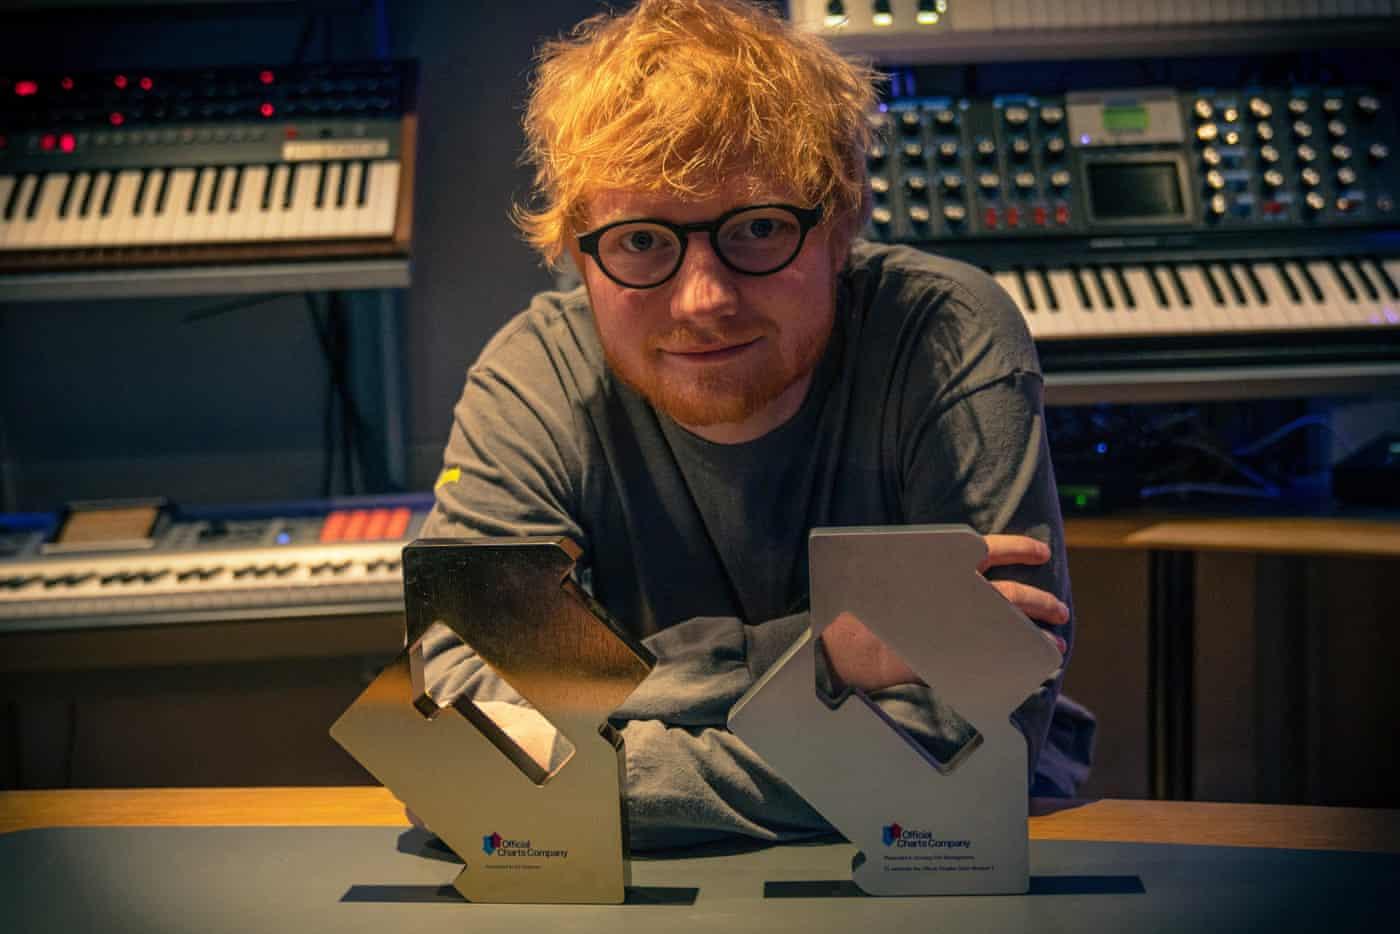 Ed Sheeran dominates UK charts with double No 1